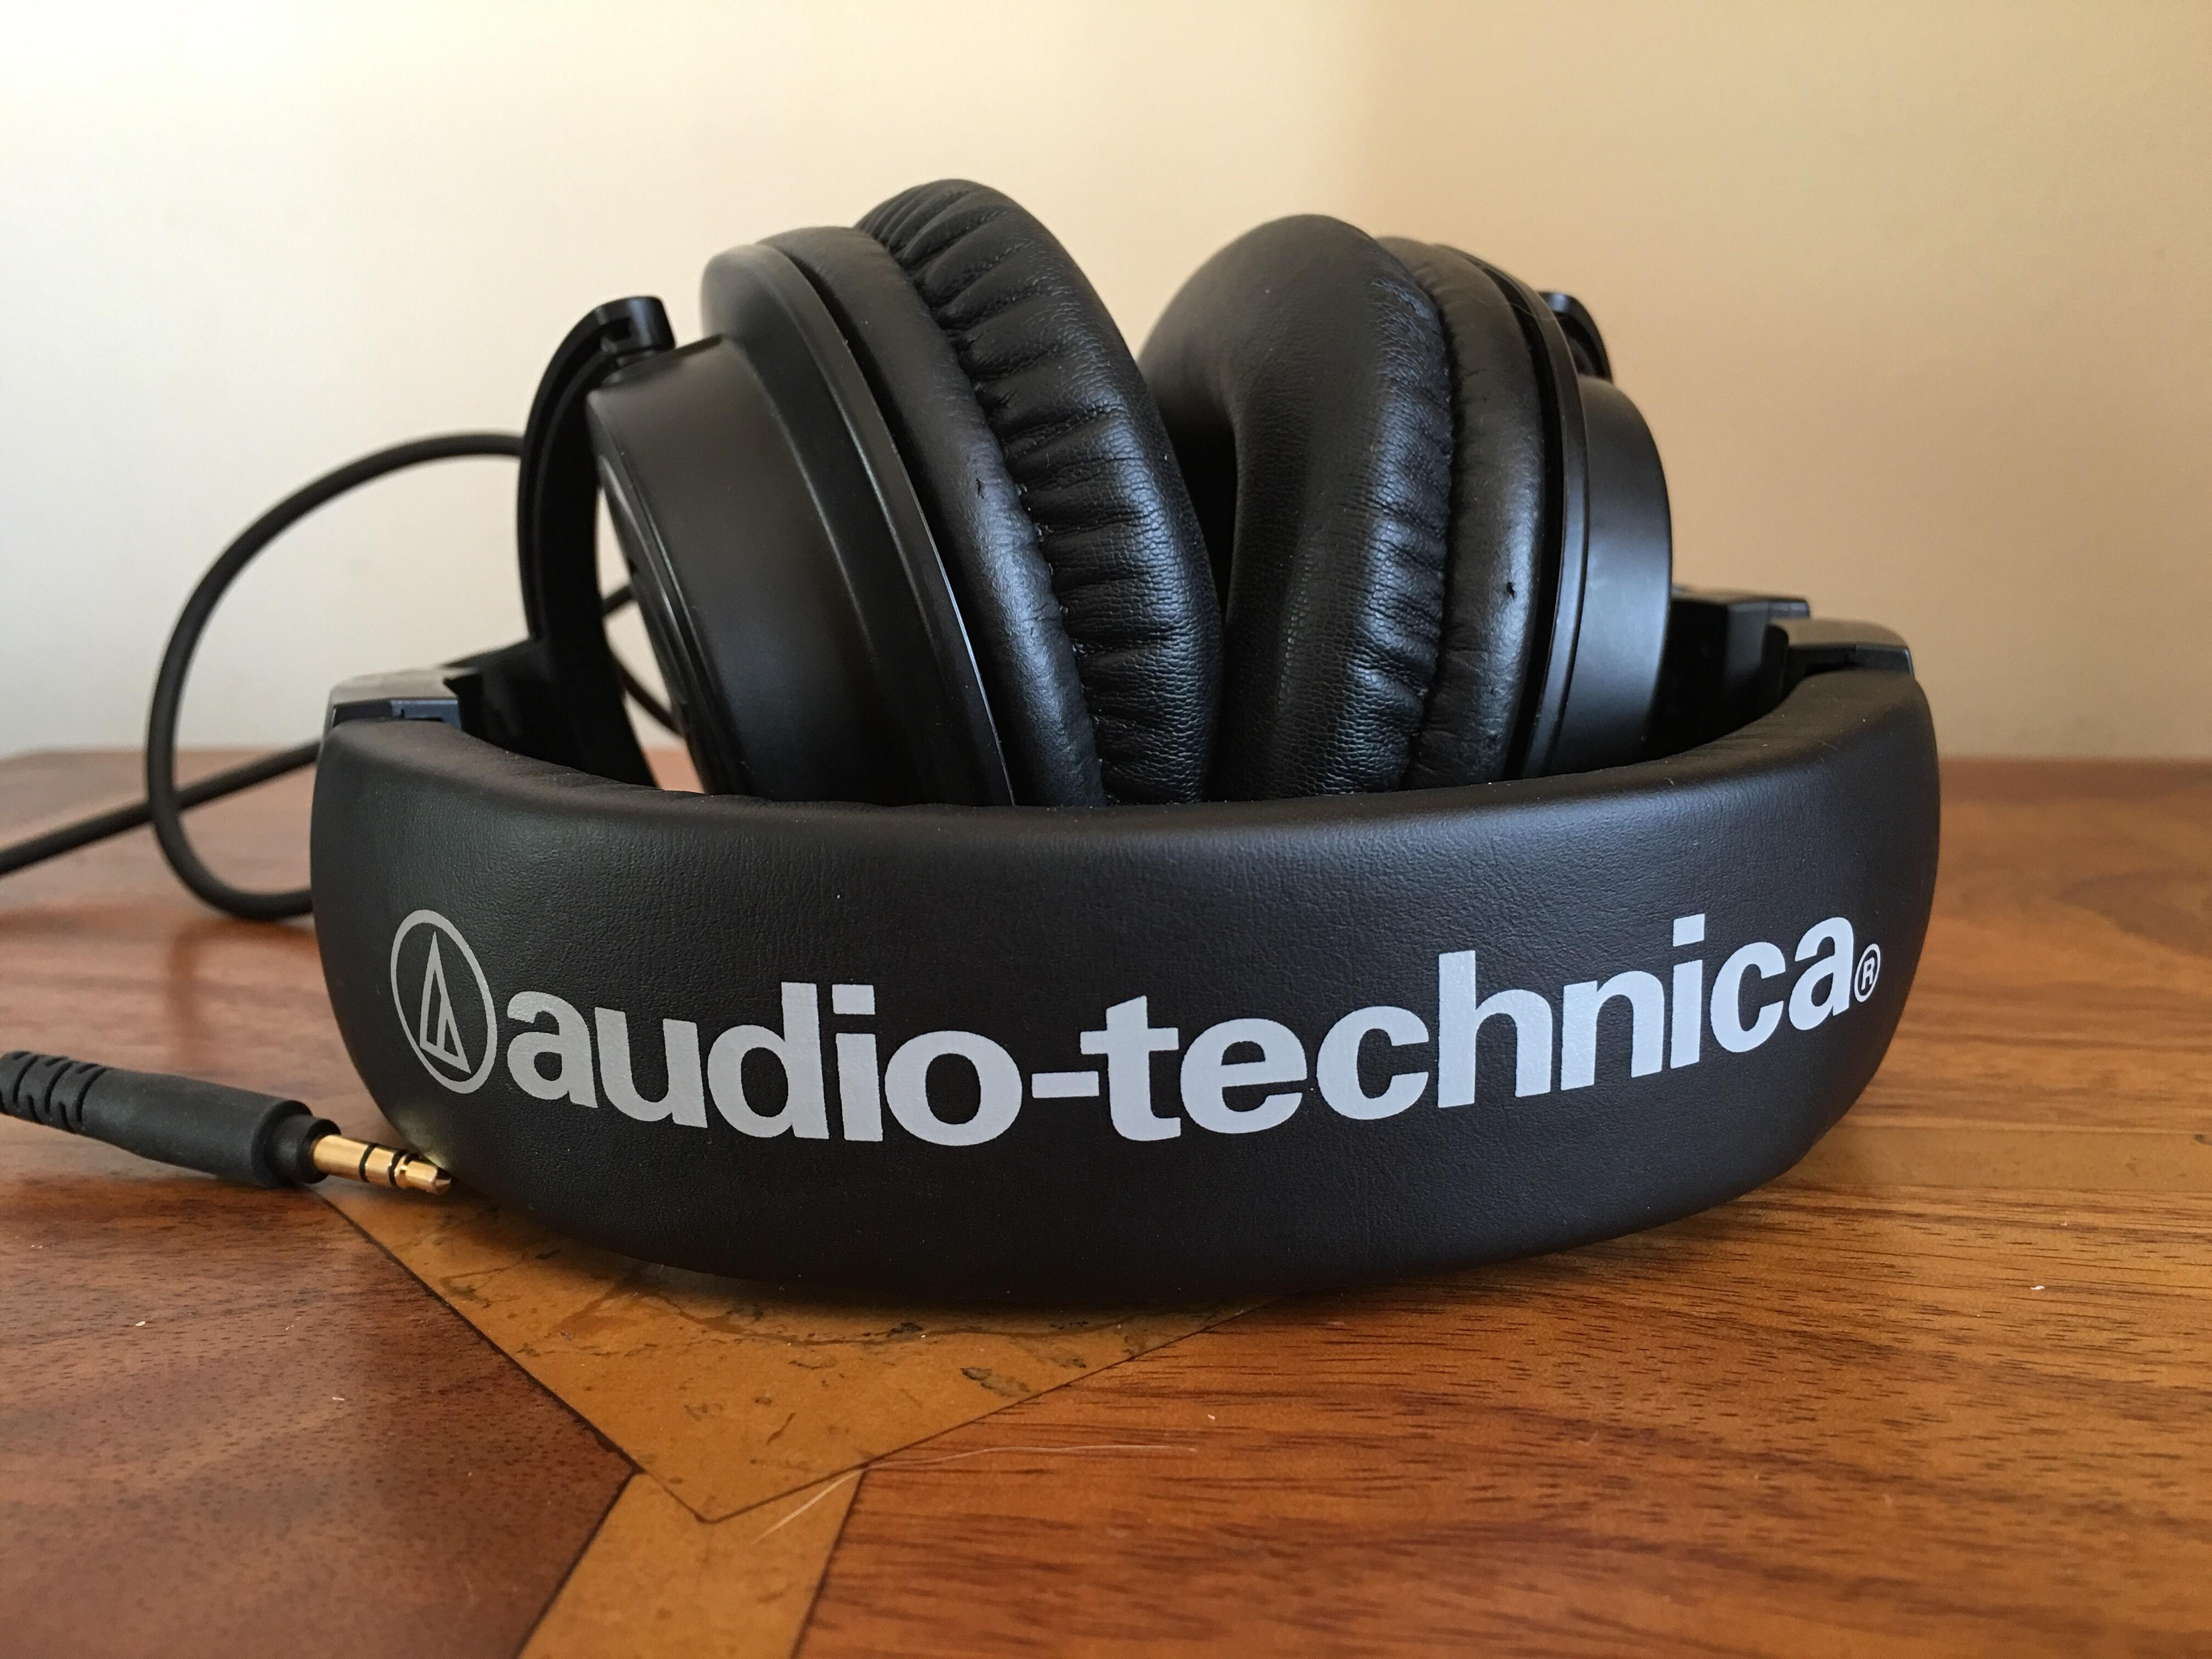 Audio Technica Ath M50x Headphones Review Gavins Gadgets M40x Monitoring Headphone